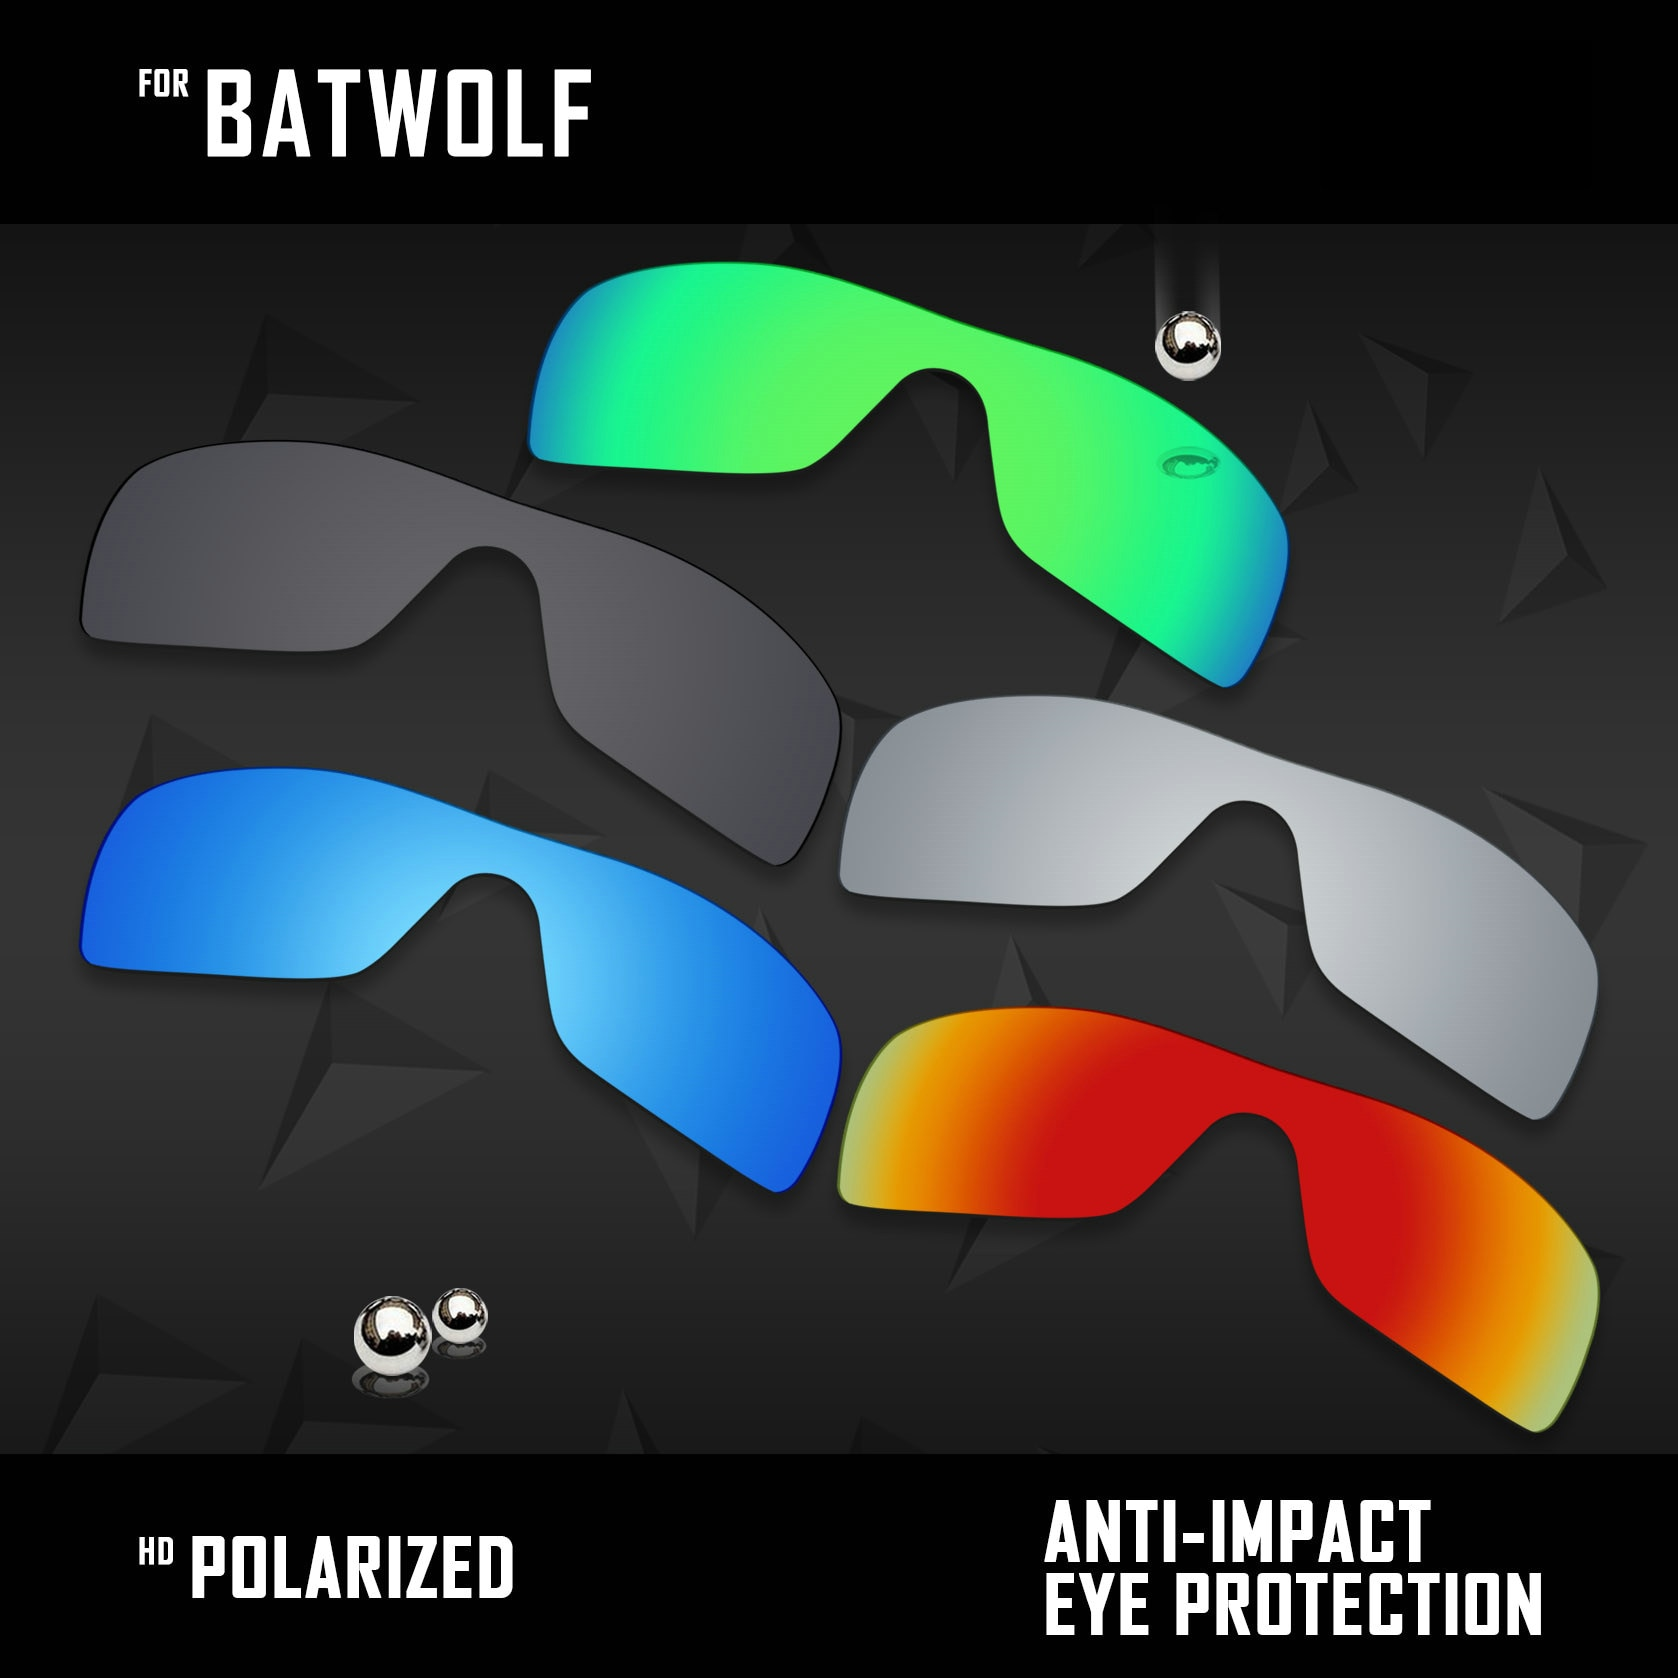 OOWLIT 5 قطع الاستقطاب النظارات الشمسية عدسات لاستبدال أوكلي Batwolf OO9101-Black والفضة و الجليد الأزرق و النار الأحمر والأخضر